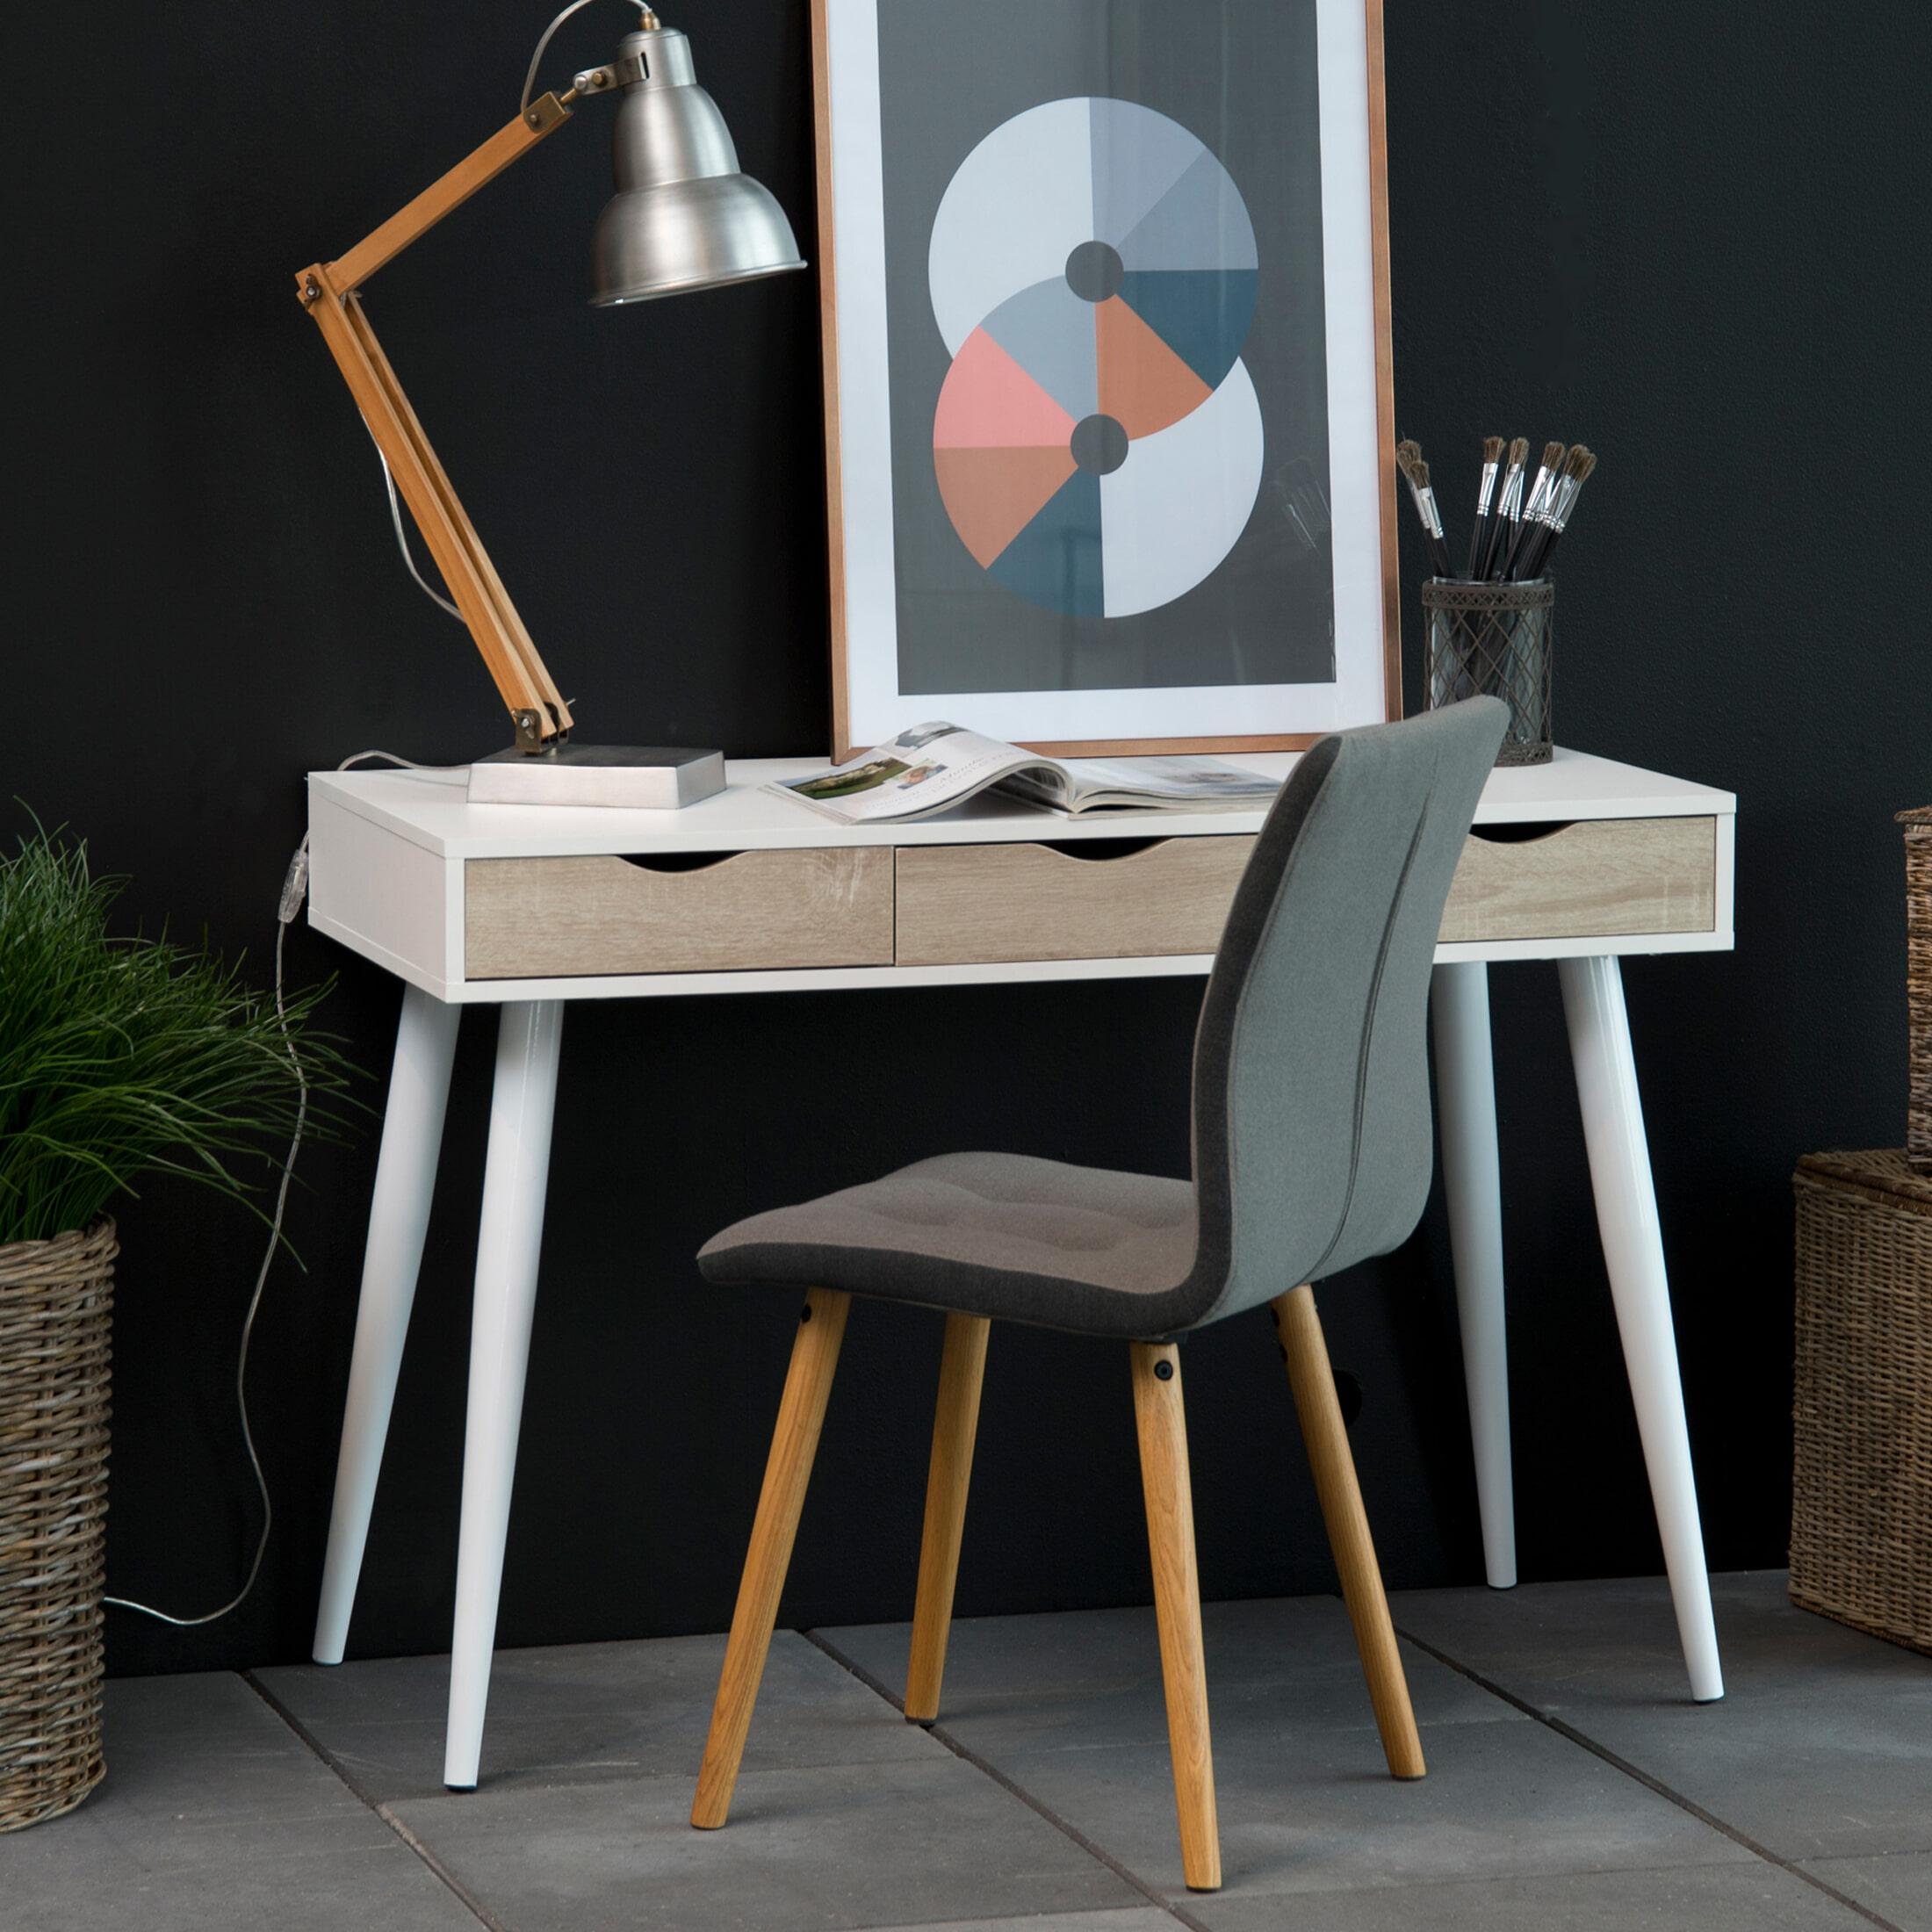 Bureau - sidetable 'Märta' 110 x 50cm met 3 laden , kleur wit - hout